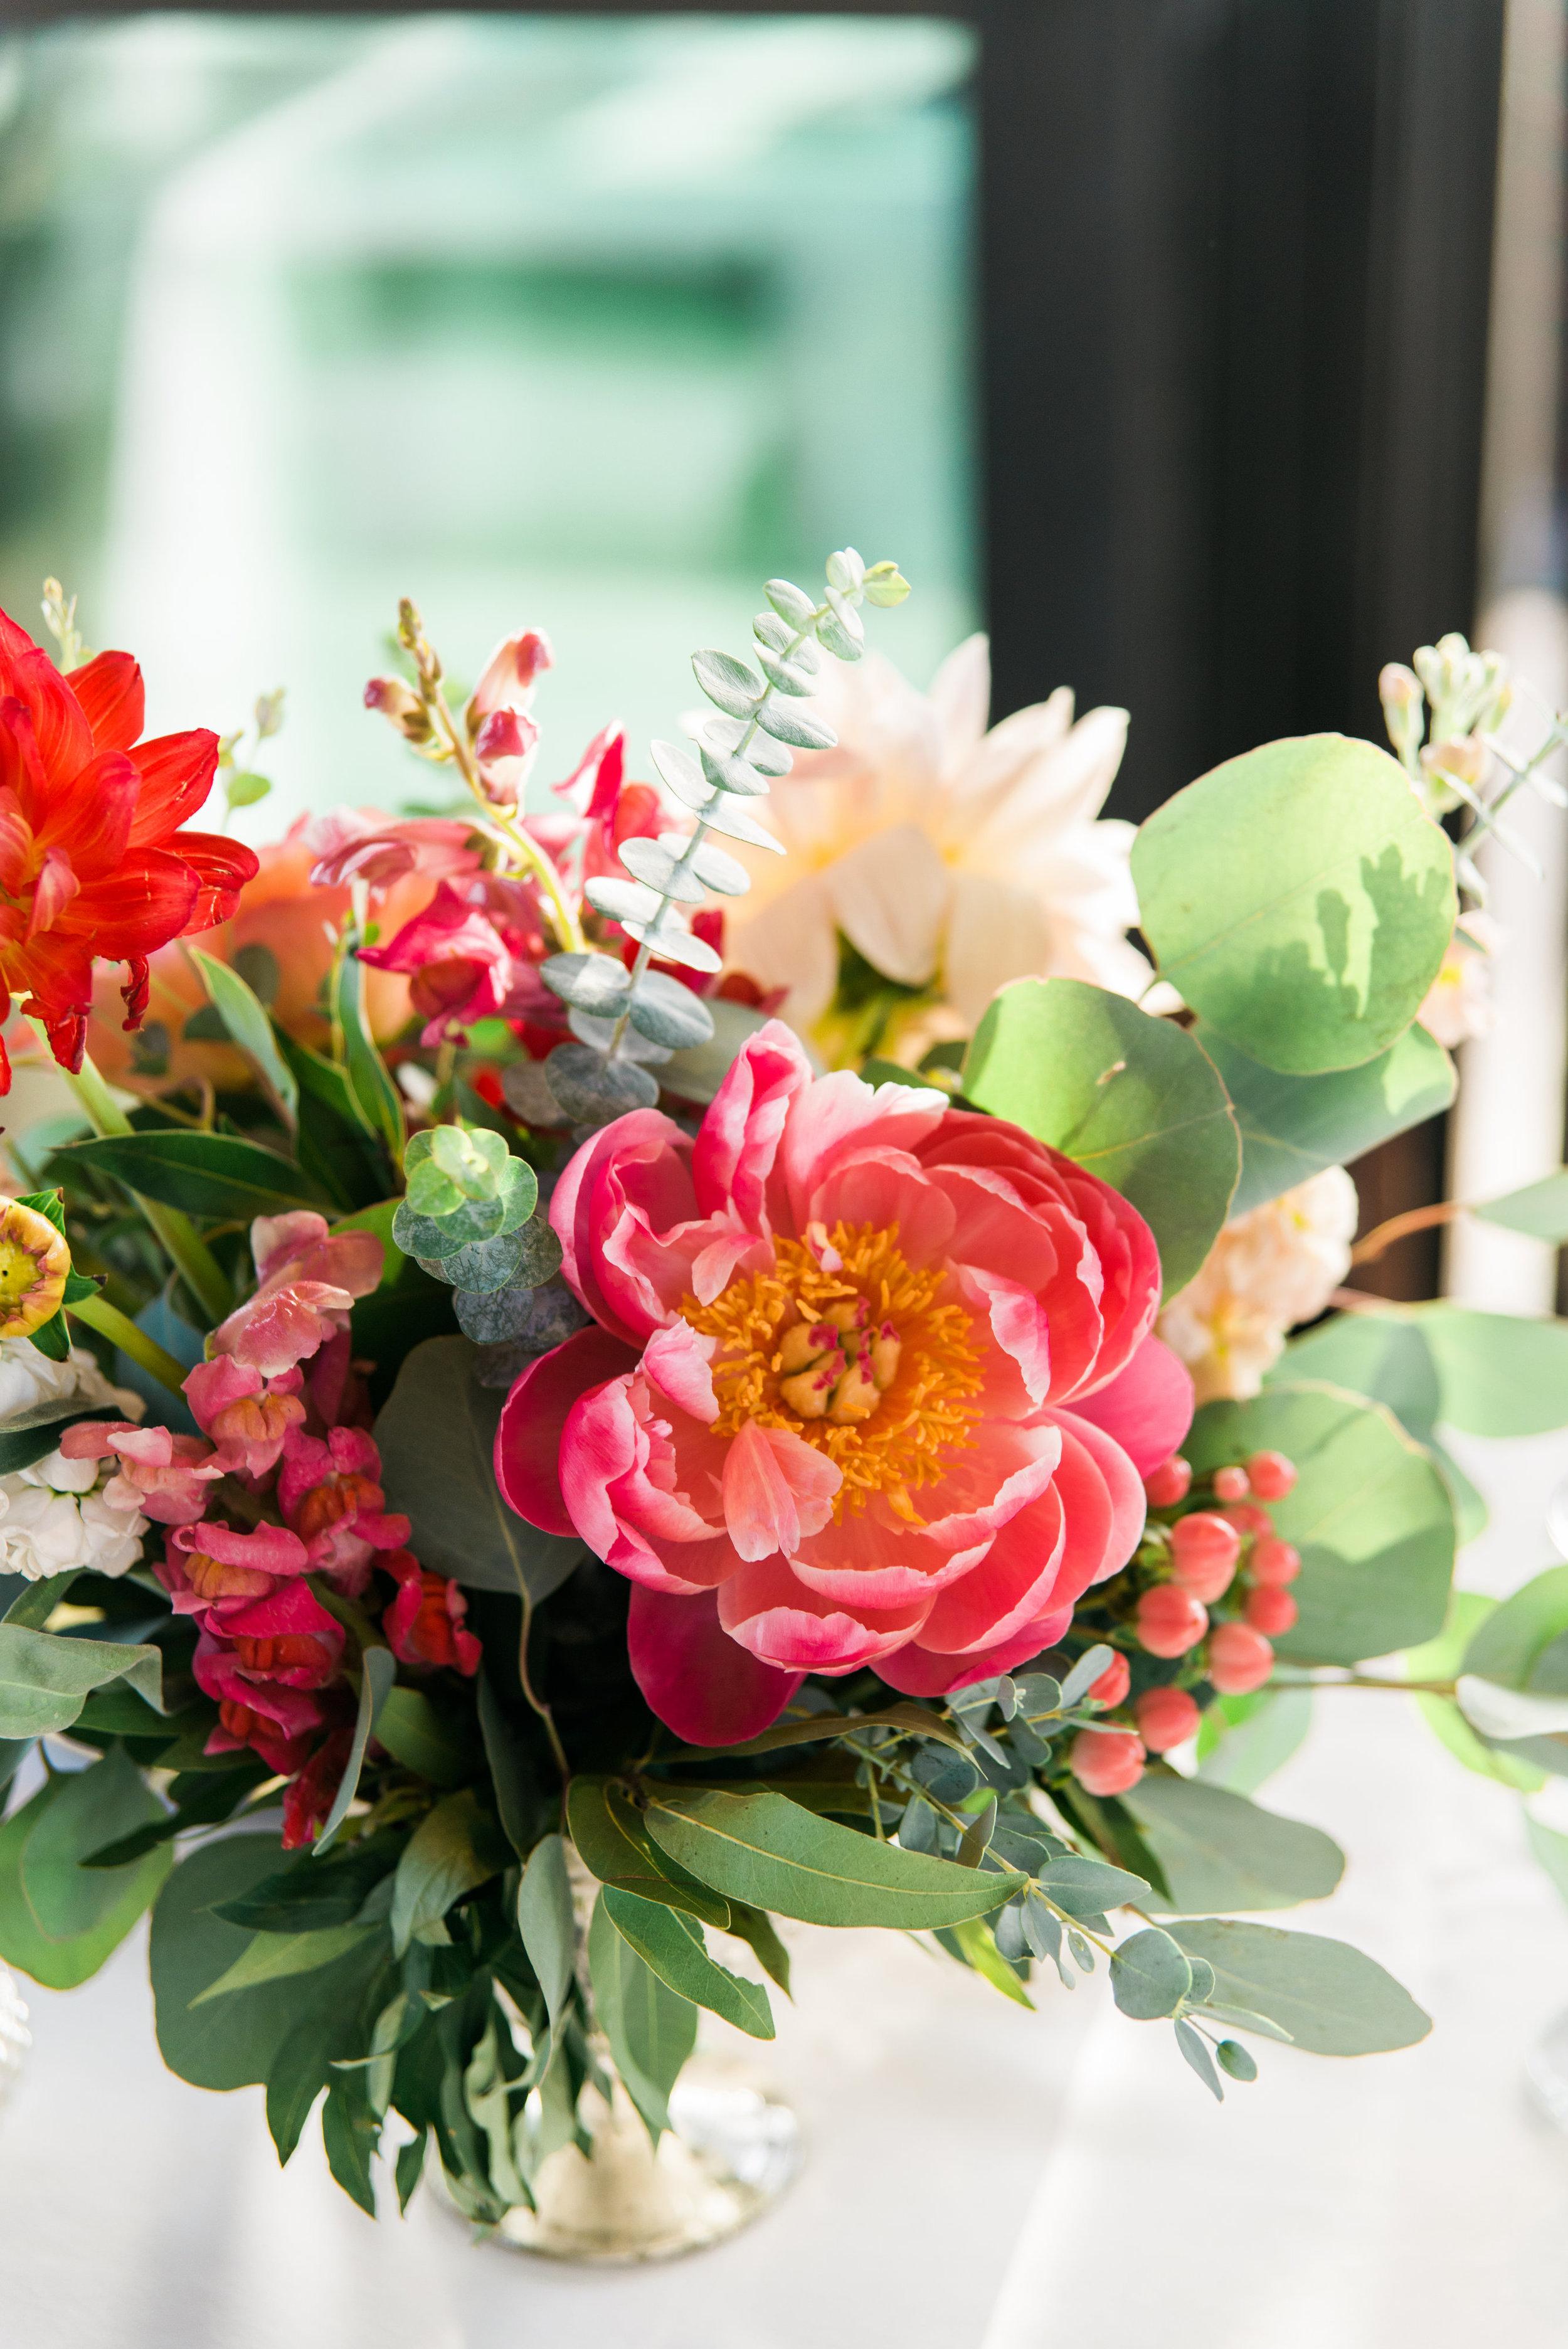 wedding flowers, pink wedding flowers, orange wedding flowers, red wedding flowers, peach wedding flowers, garden wedding flowers